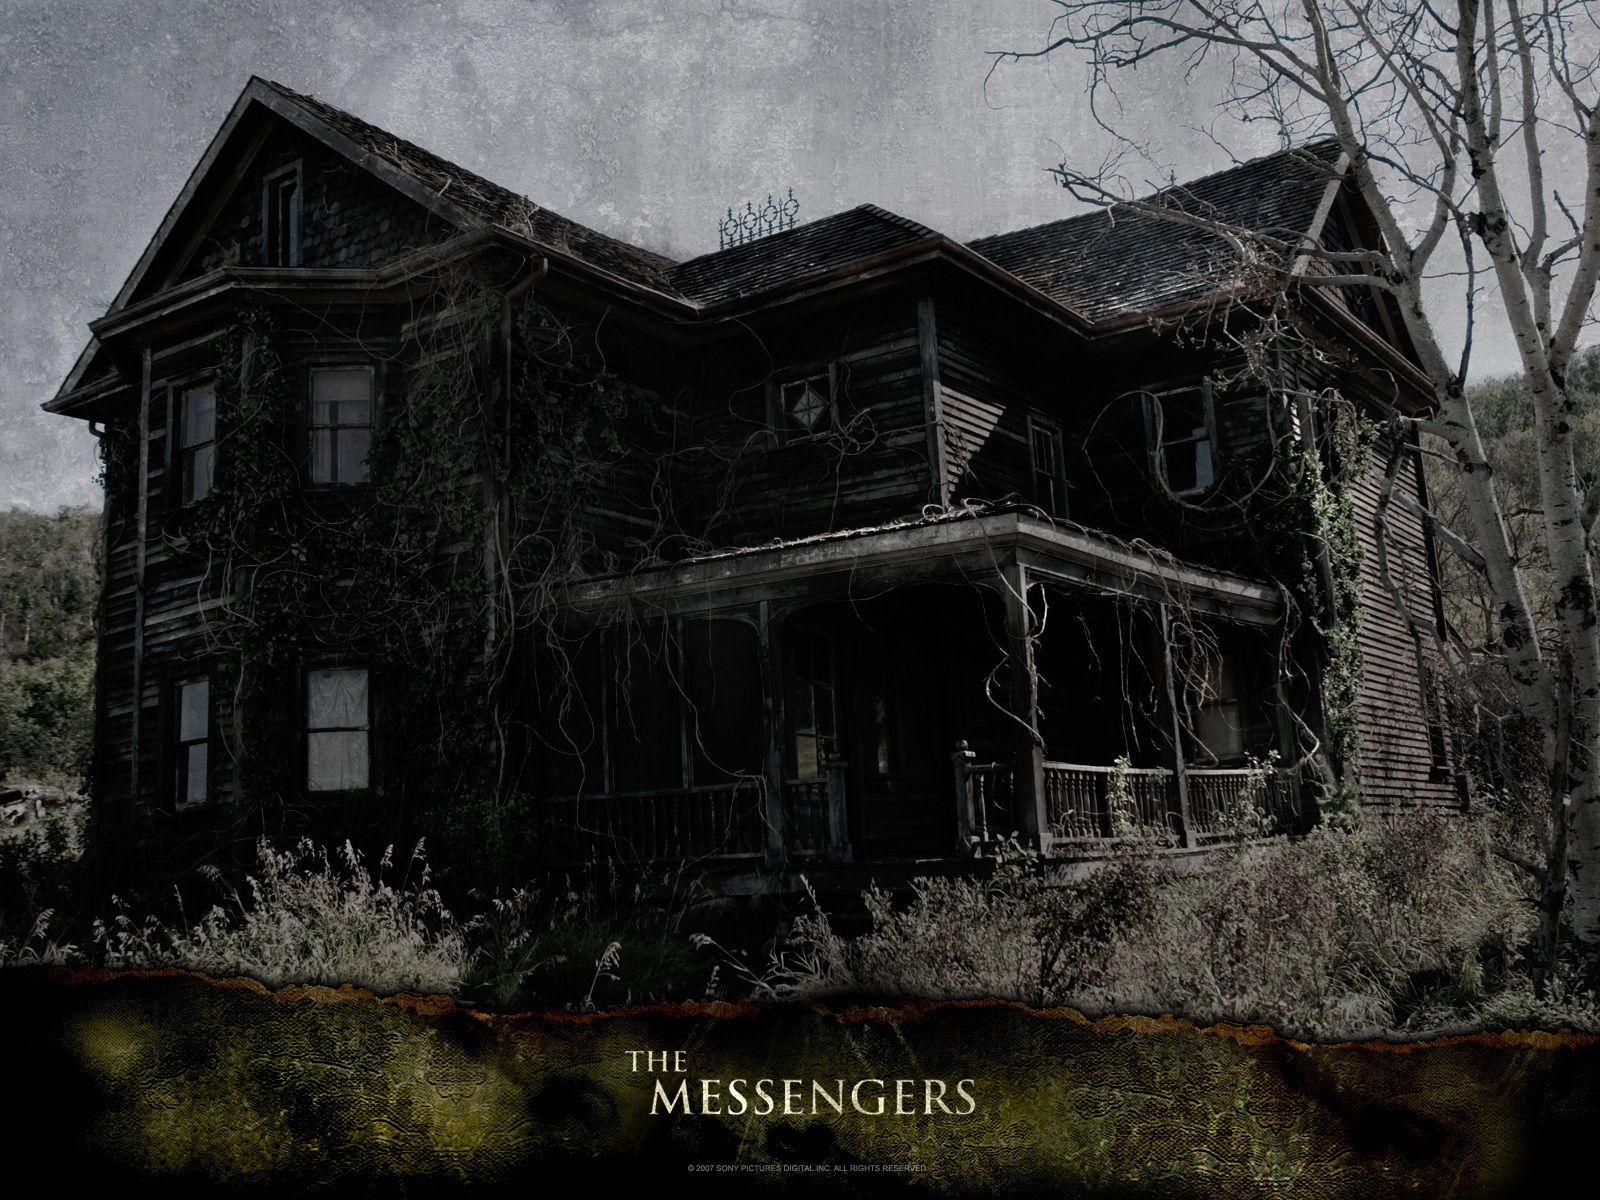 The Messengers - Horror Movies Wallpaper (7084822) - Fanpop